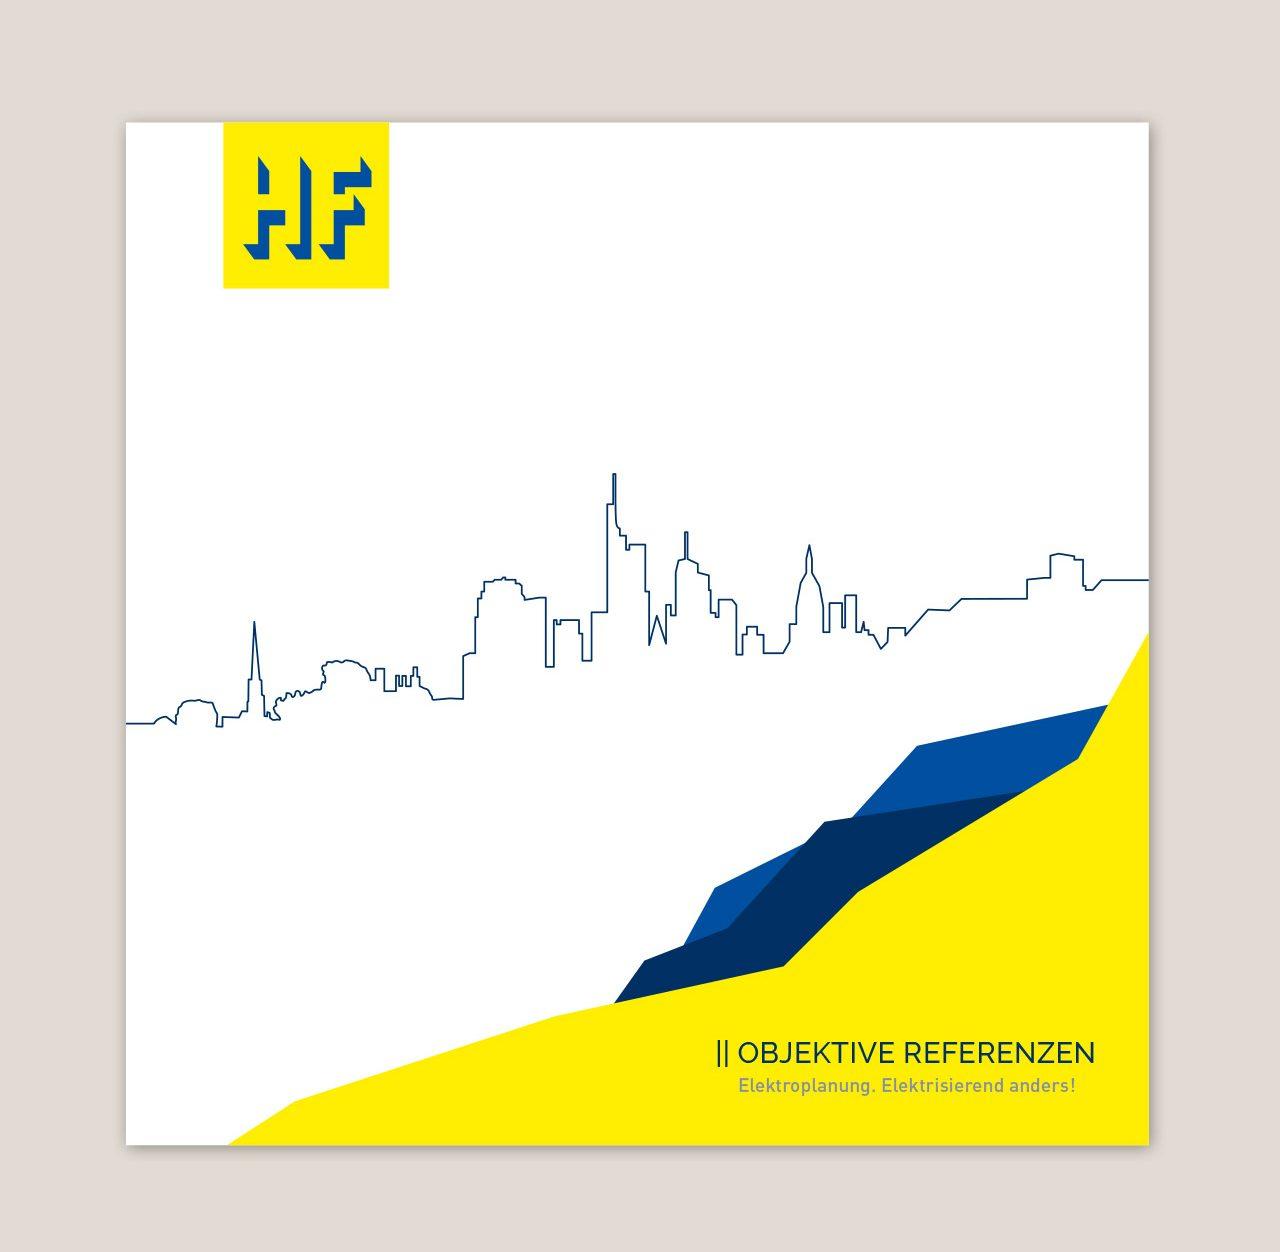 hf-elektro_1280x1280